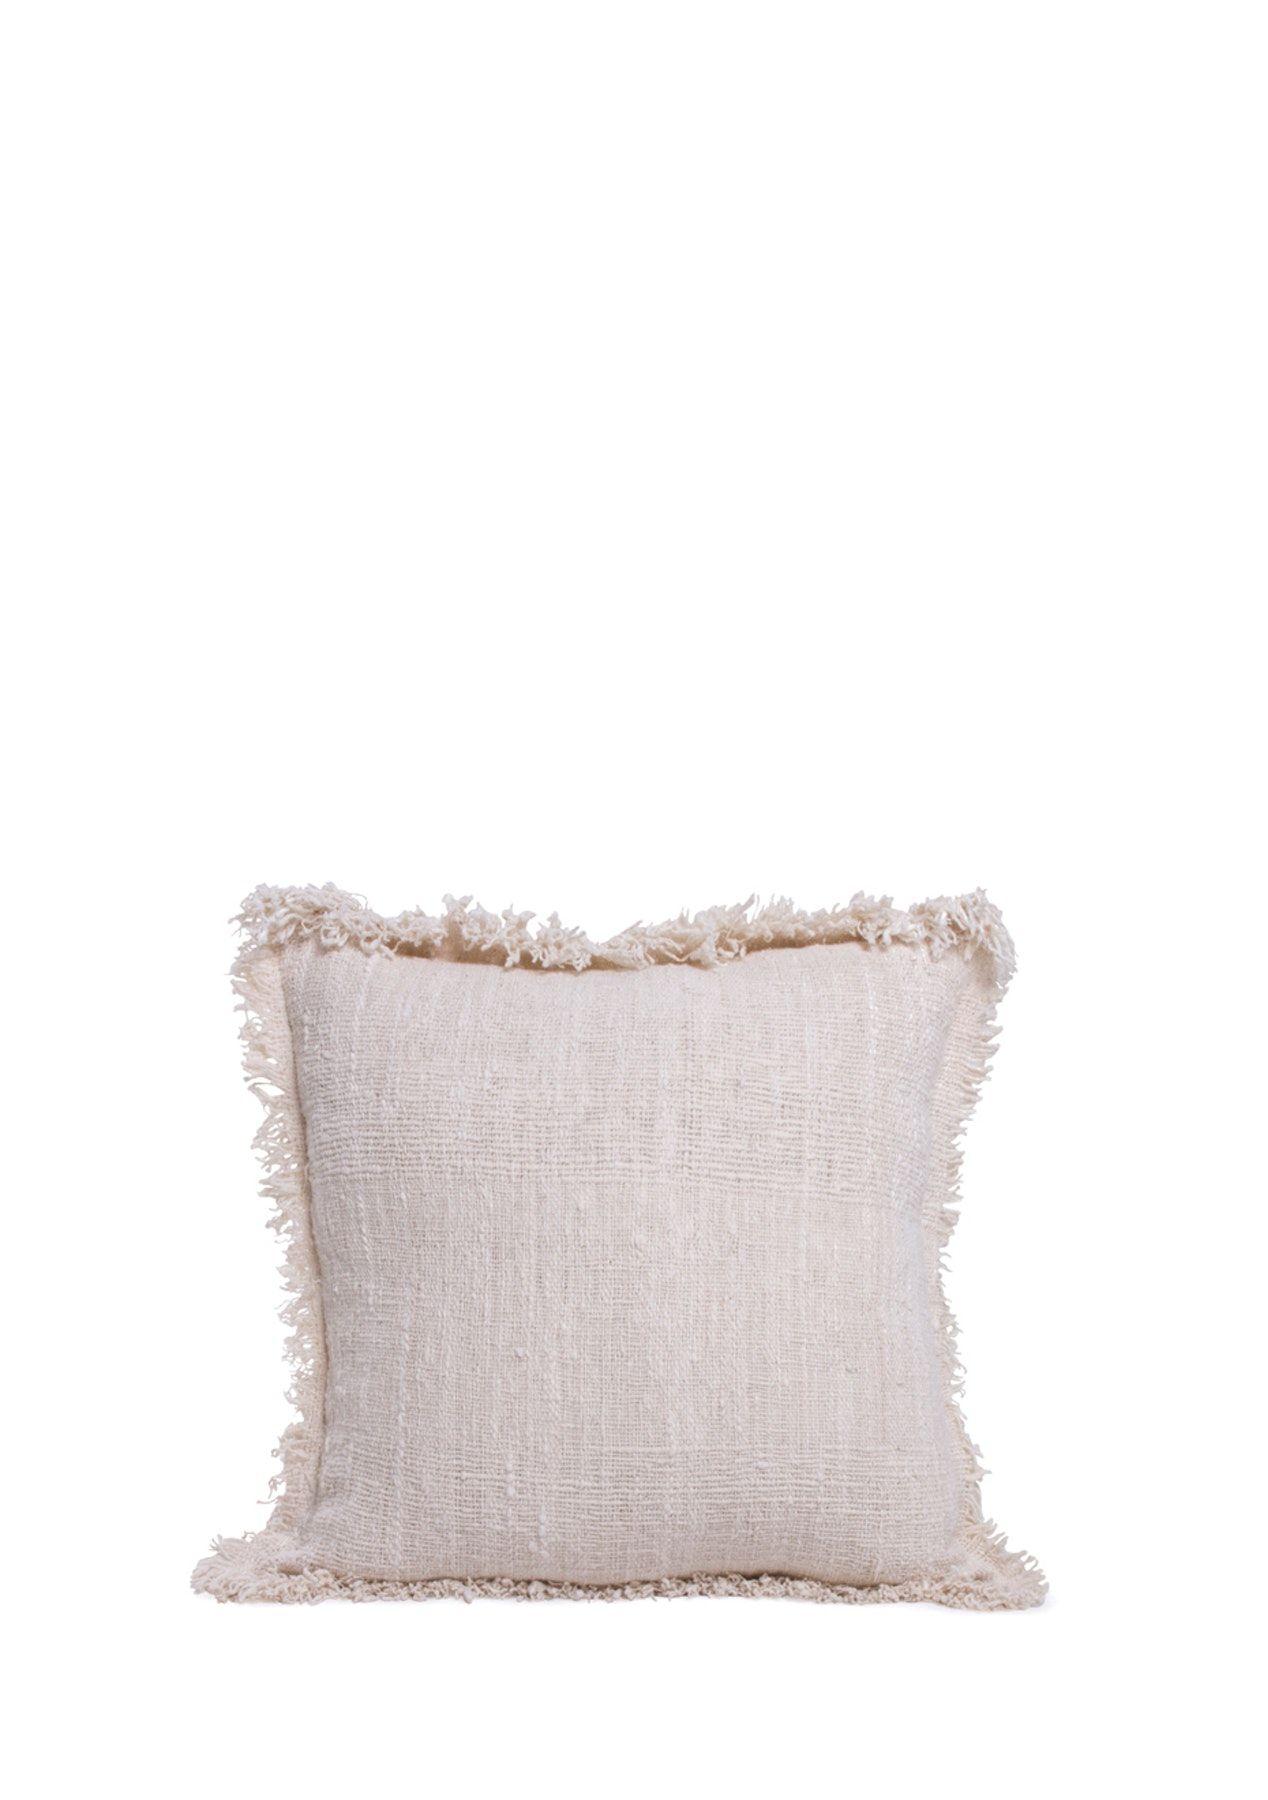 Kim Soo Luxe Cushion Cover / Natural Natural 12